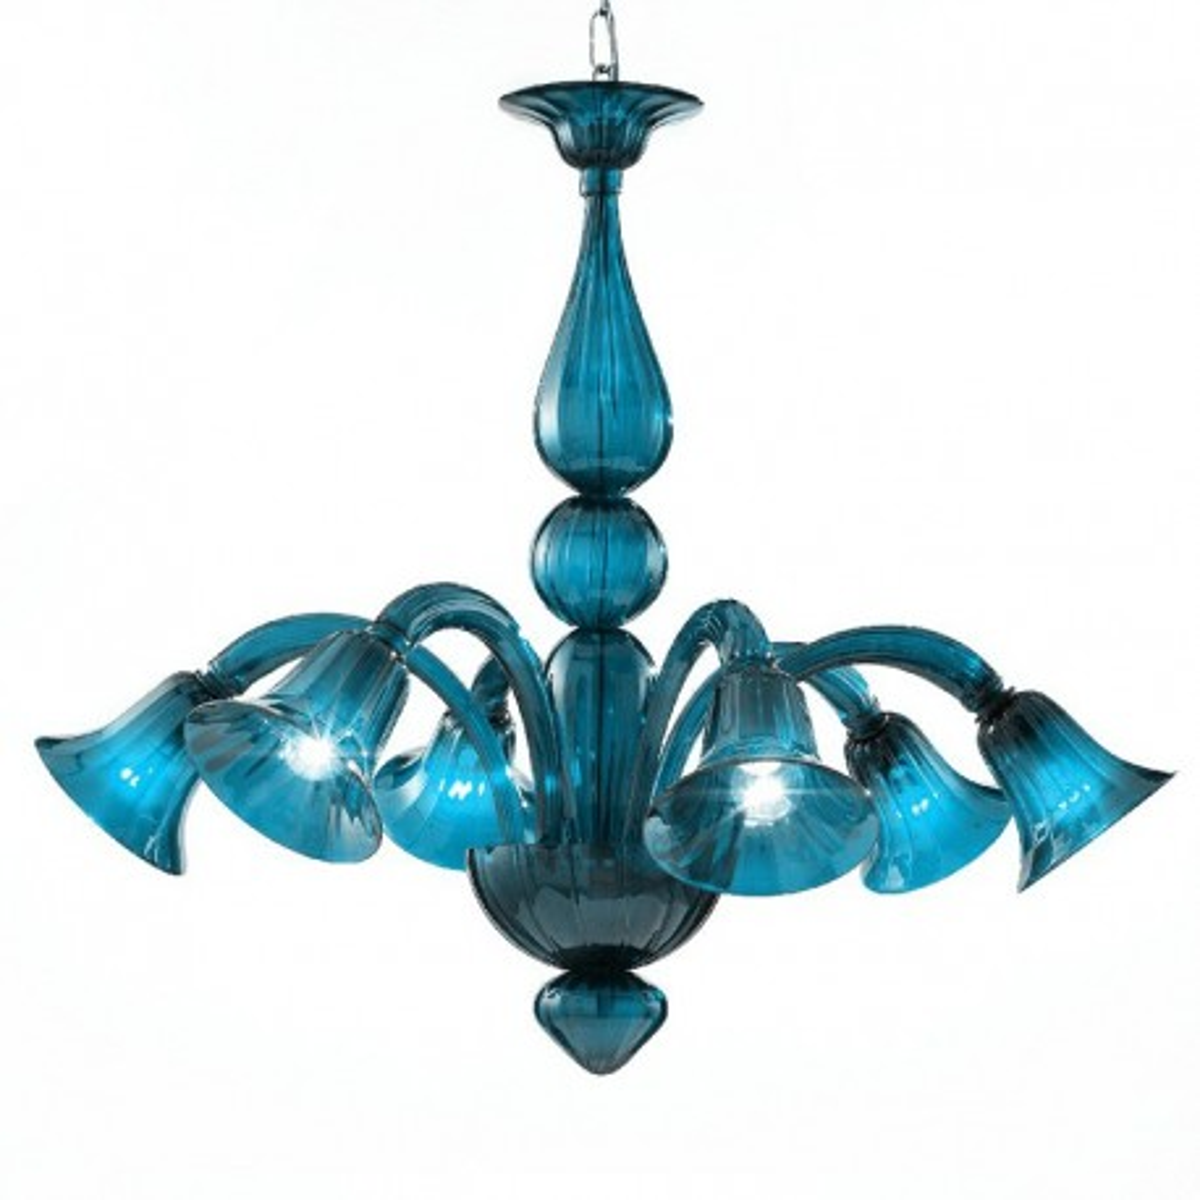 Serenissima 6 luces lámpara de Murano - color aguamarina